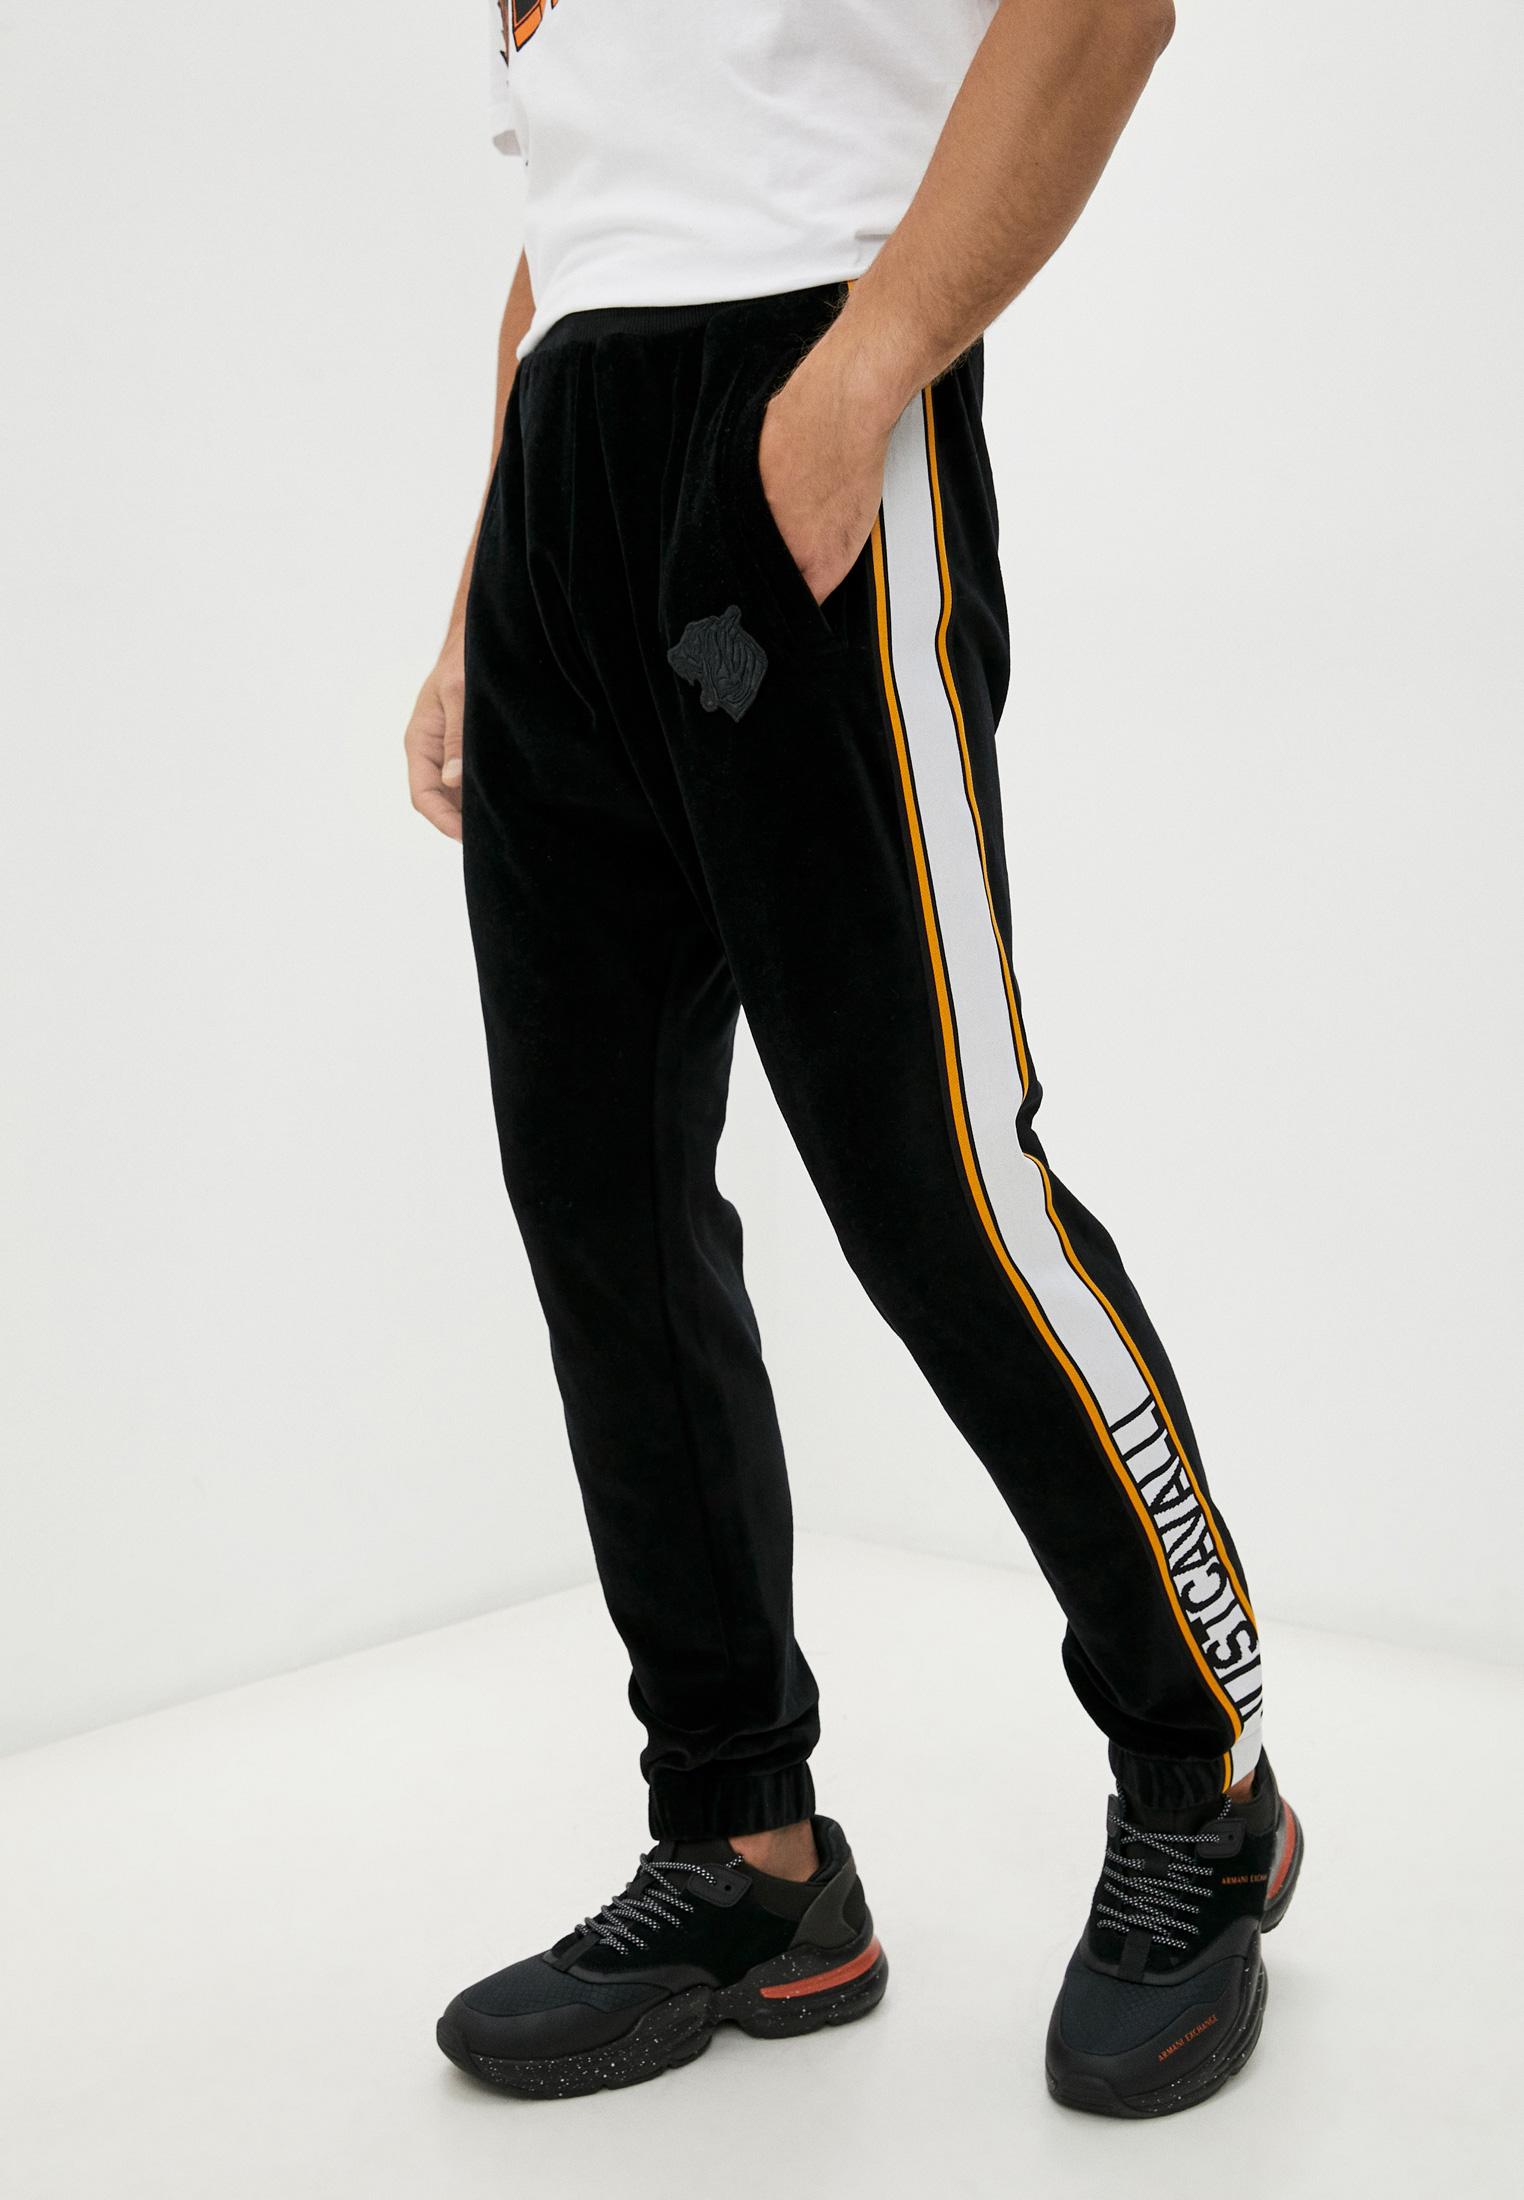 Мужские спортивные брюки Just Cavalli (Джаст Кавалли) S03KA0259N21589